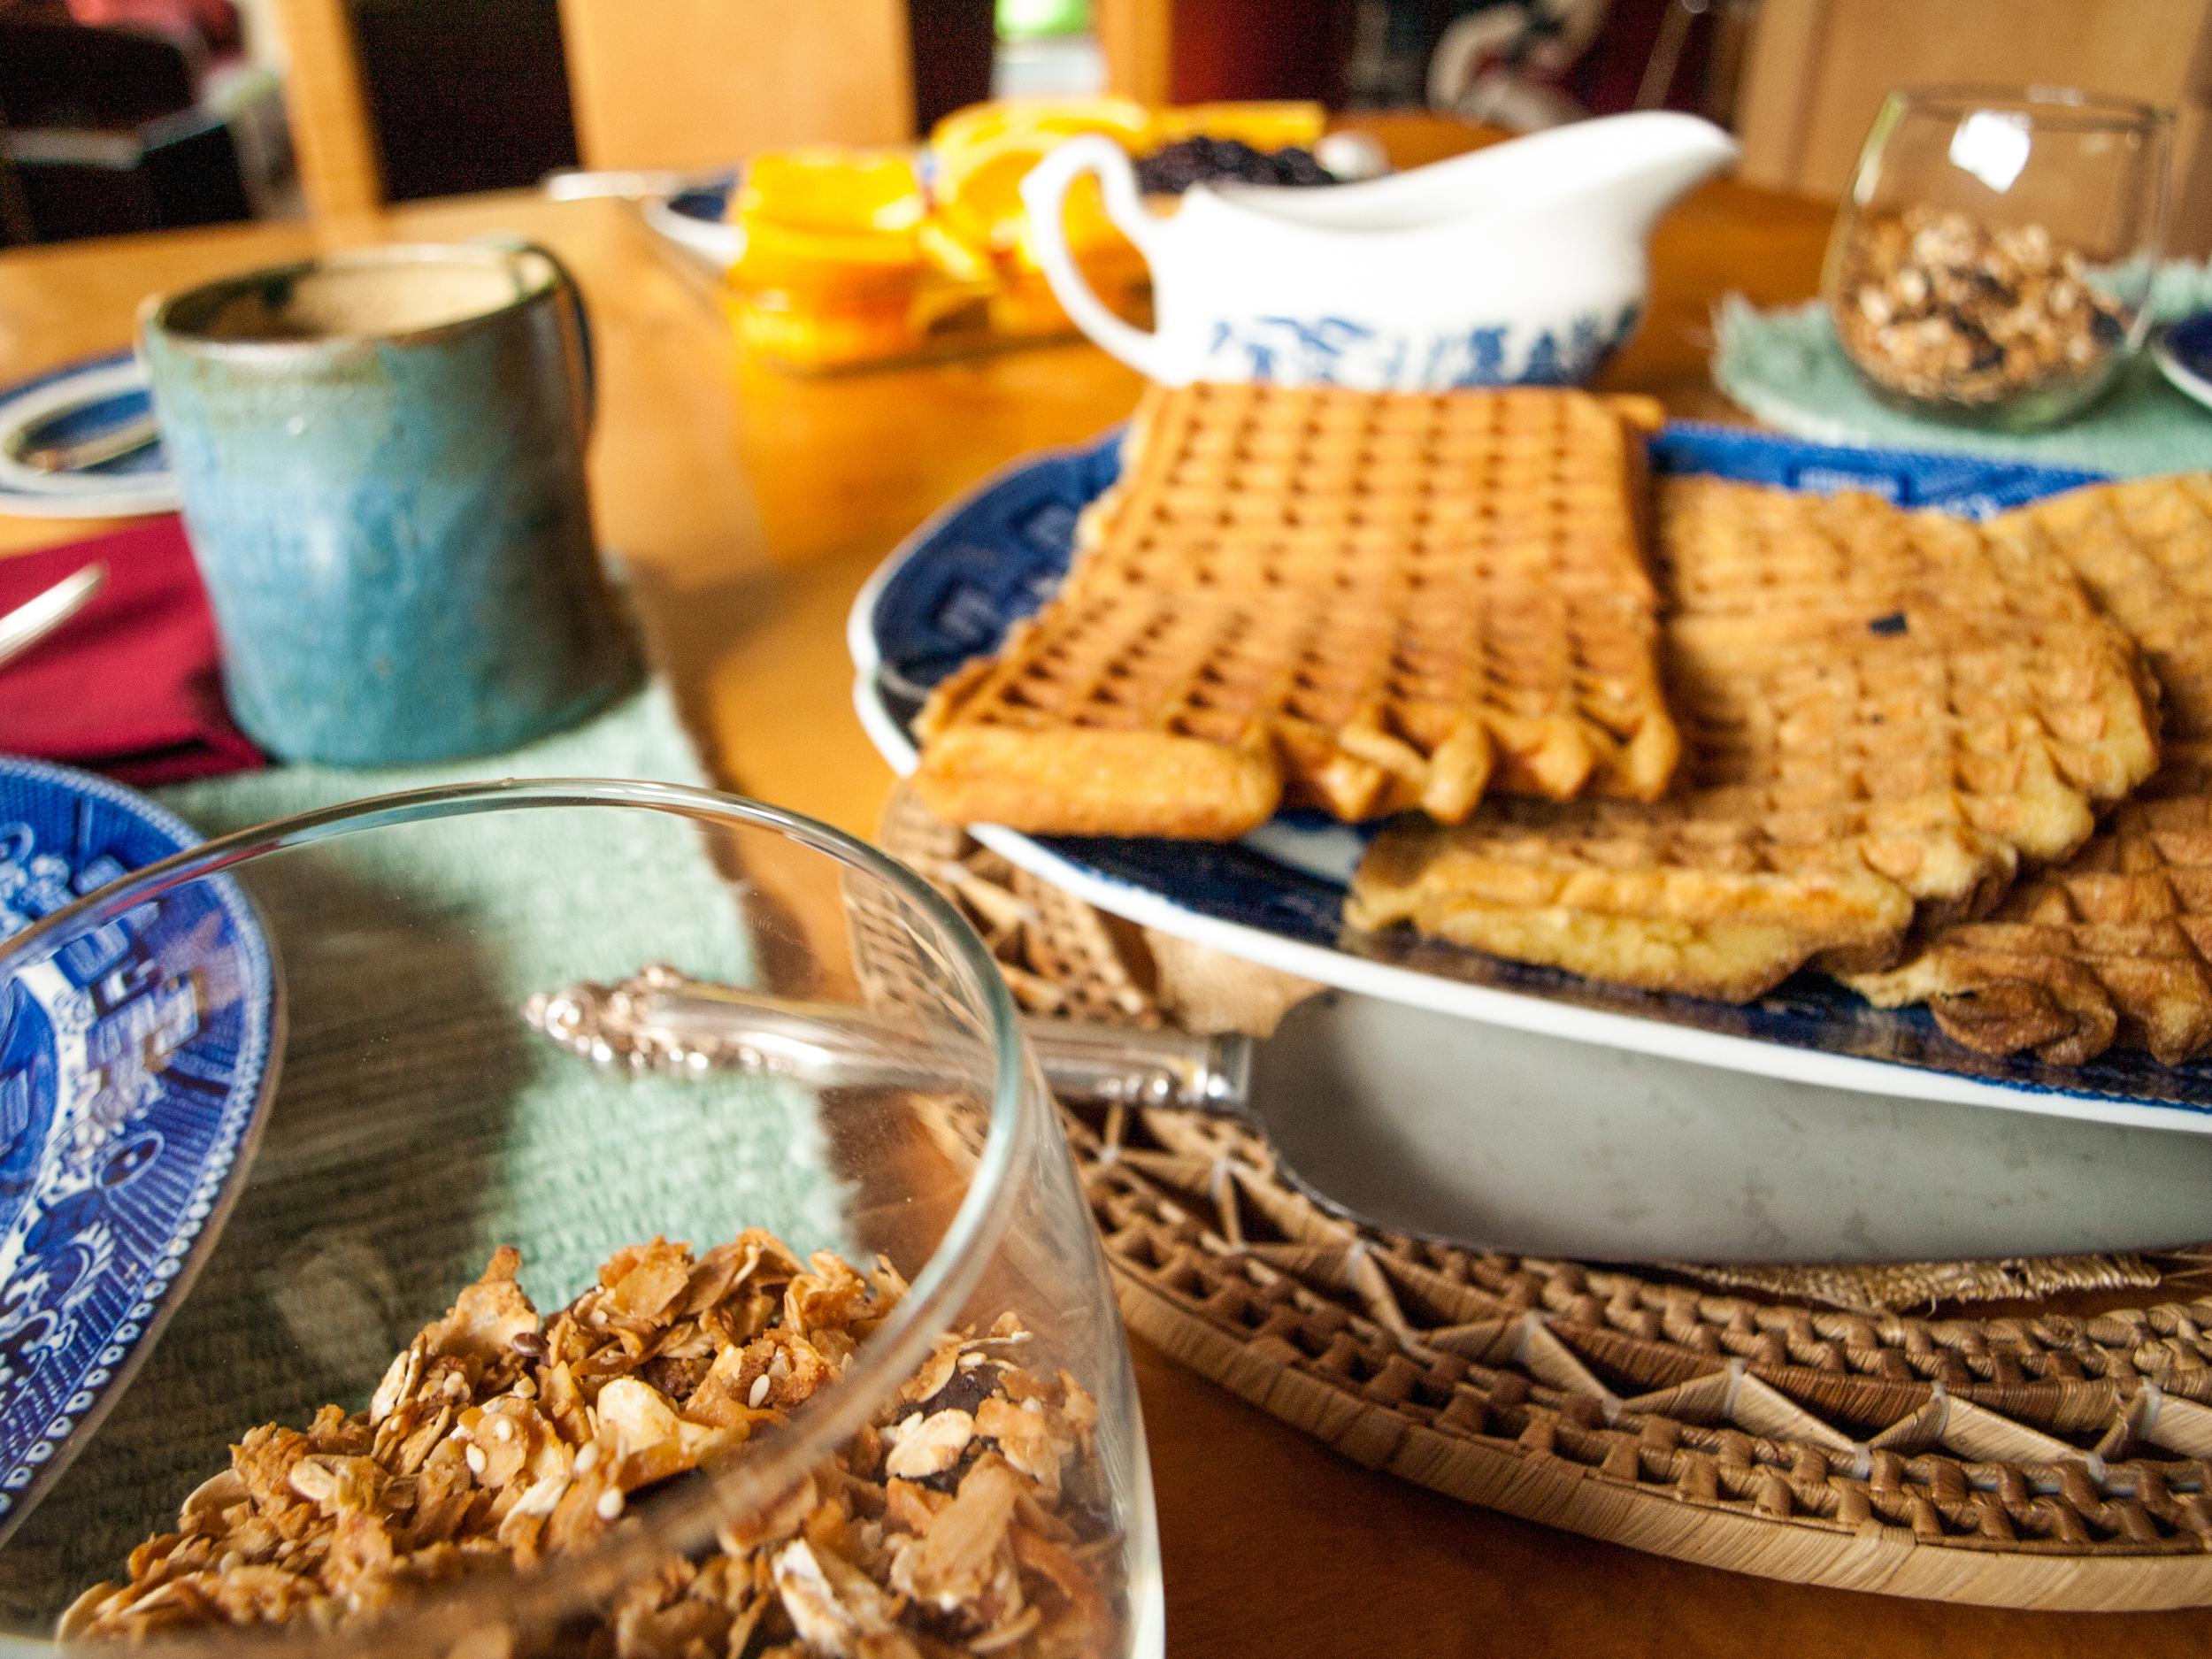 homemade granola and waffles, mmmm...